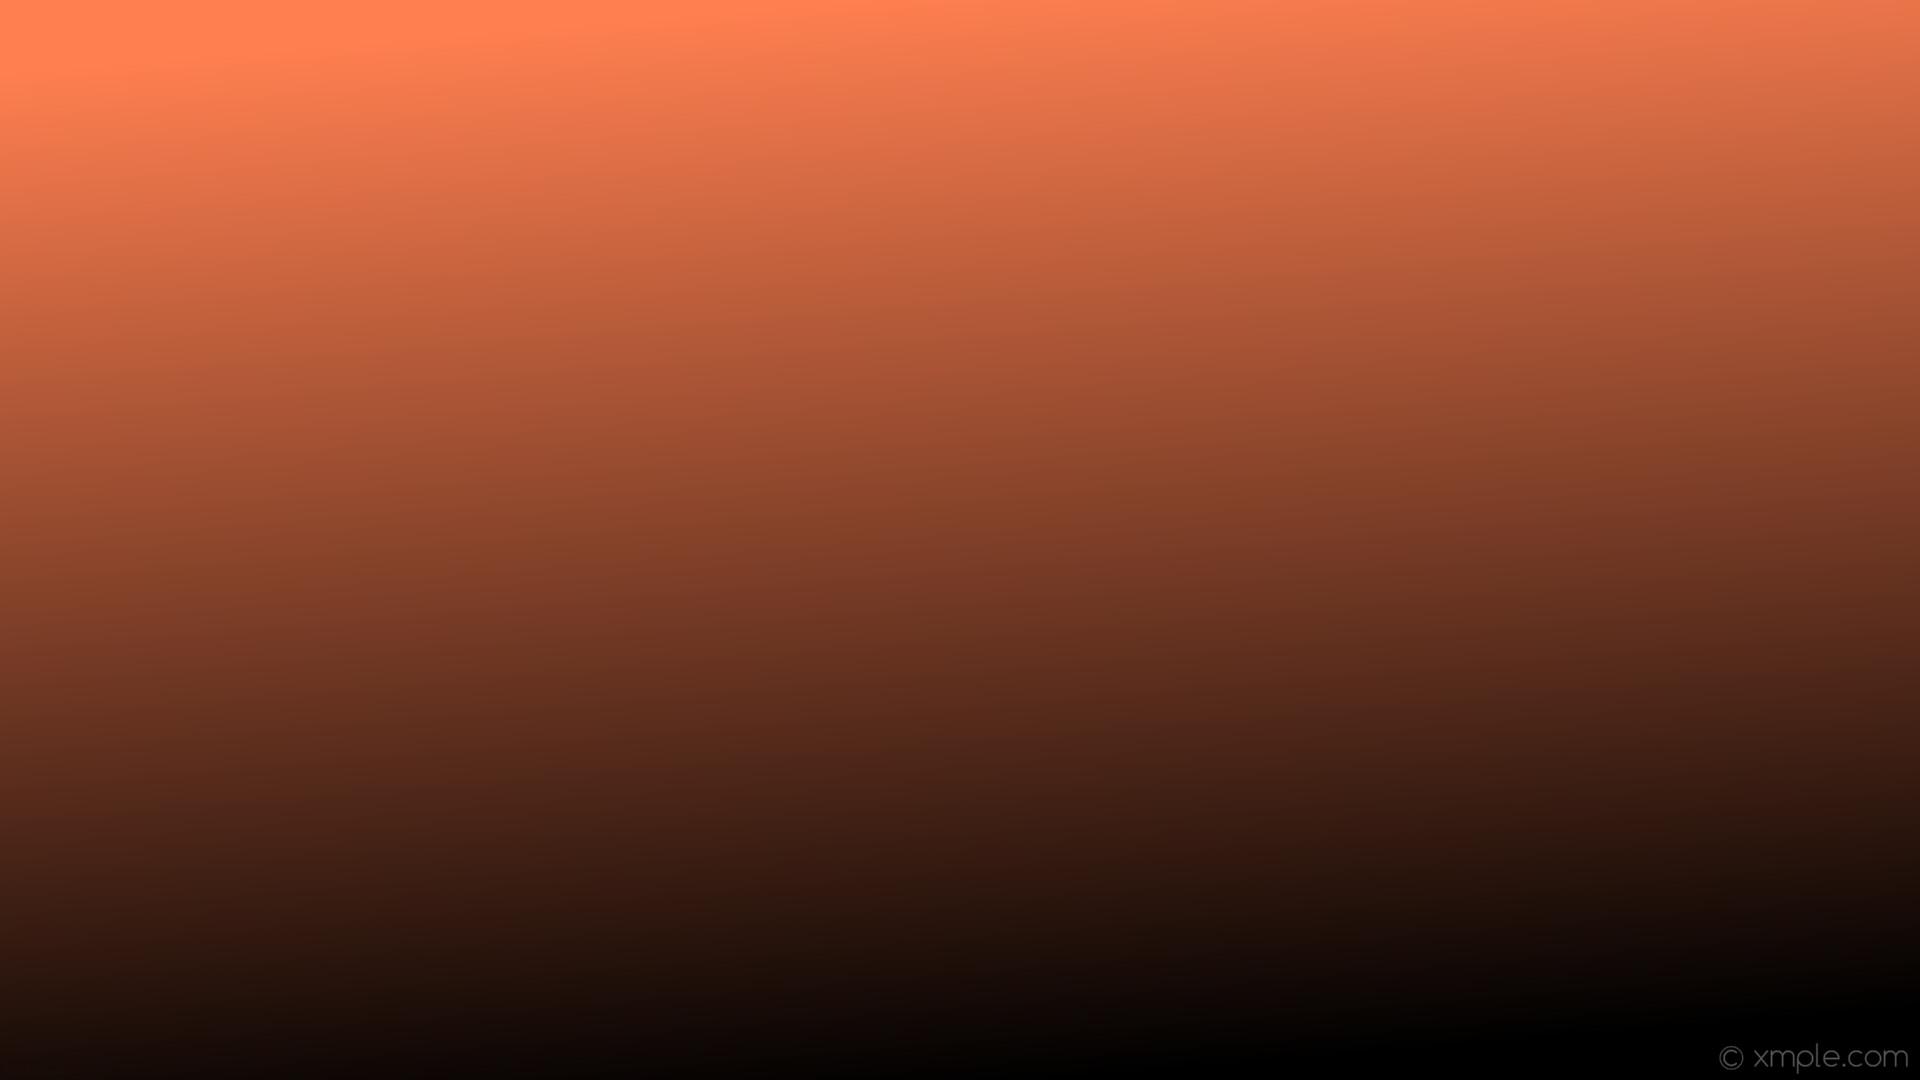 Res: 1920x1080, wallpaper gradient orange black linear coral #000000 #ff7f50 285°